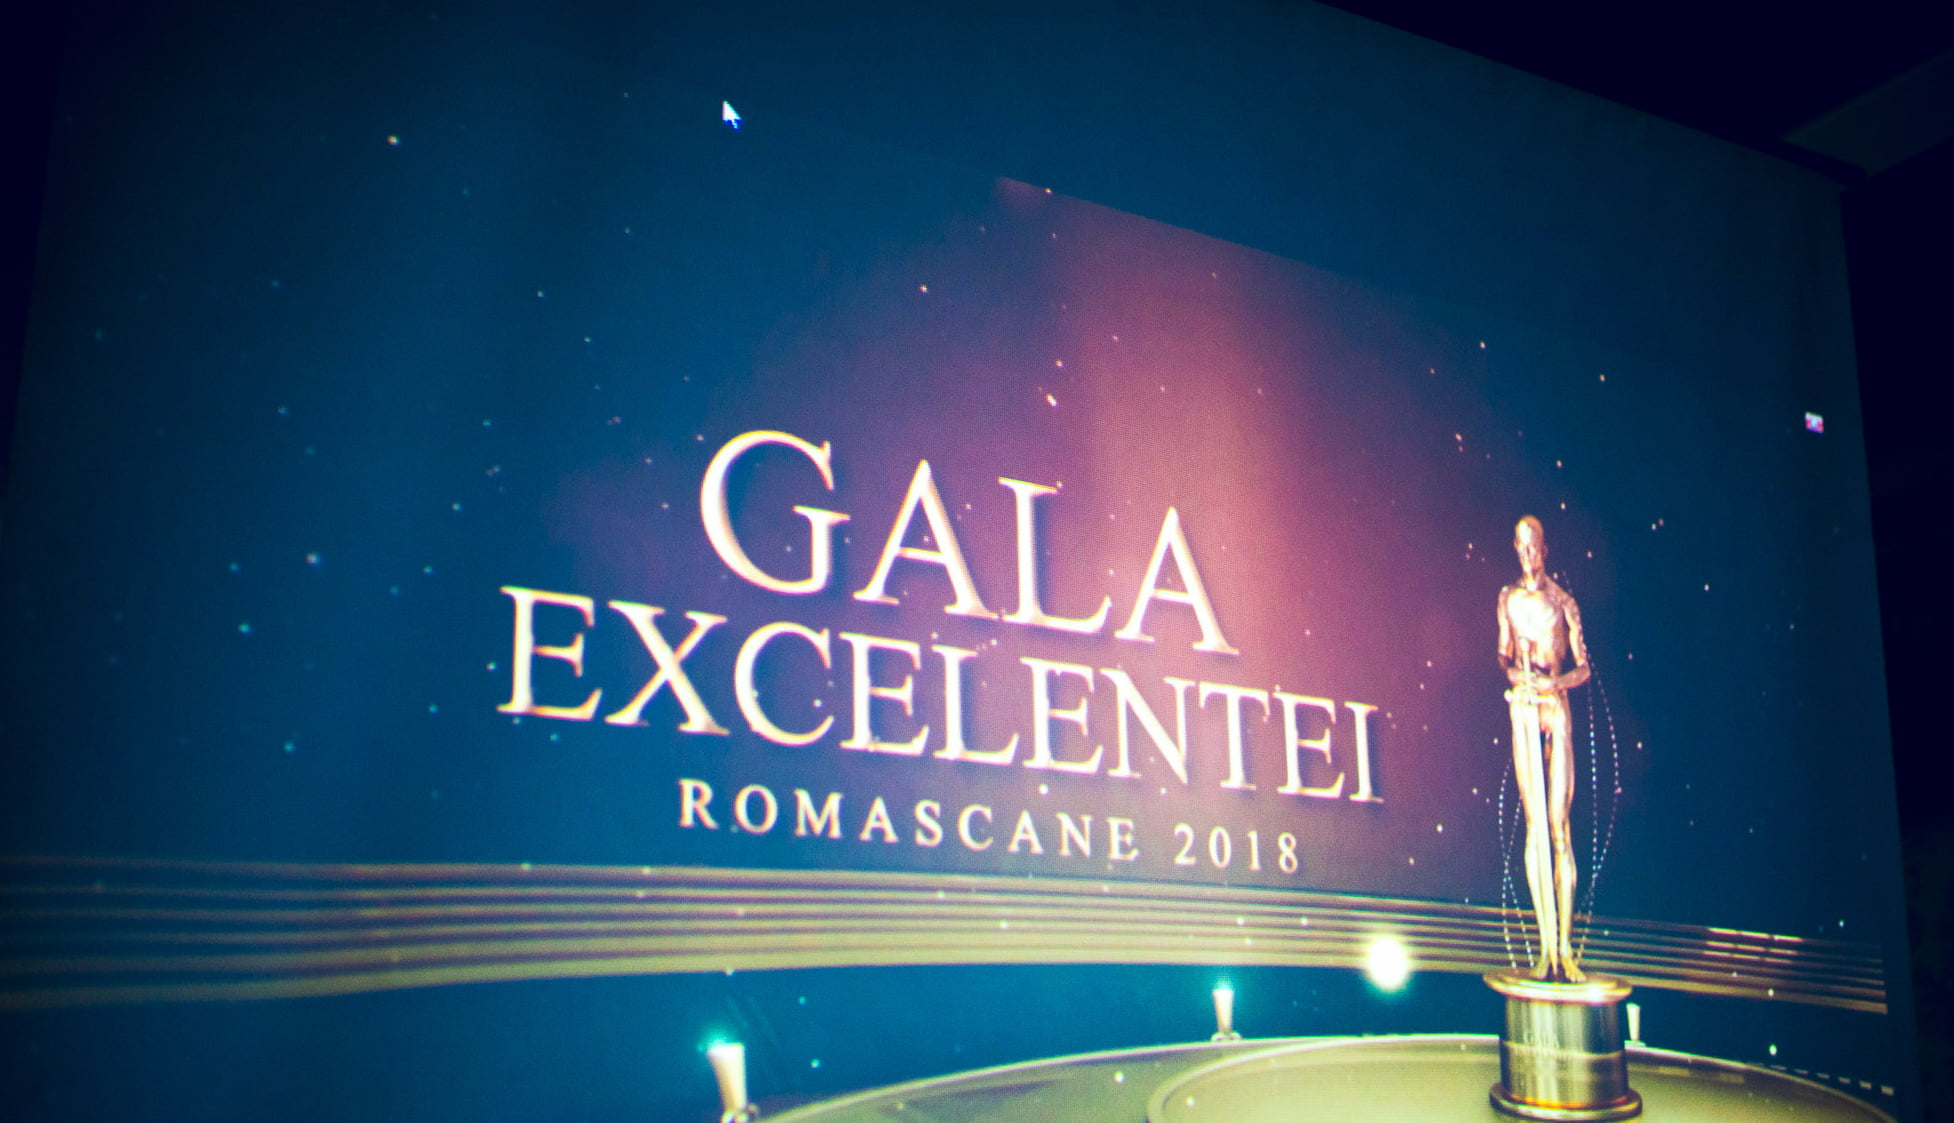 [FOTO] Premiile ediției 2018 a Galei Excelenței Romașcane